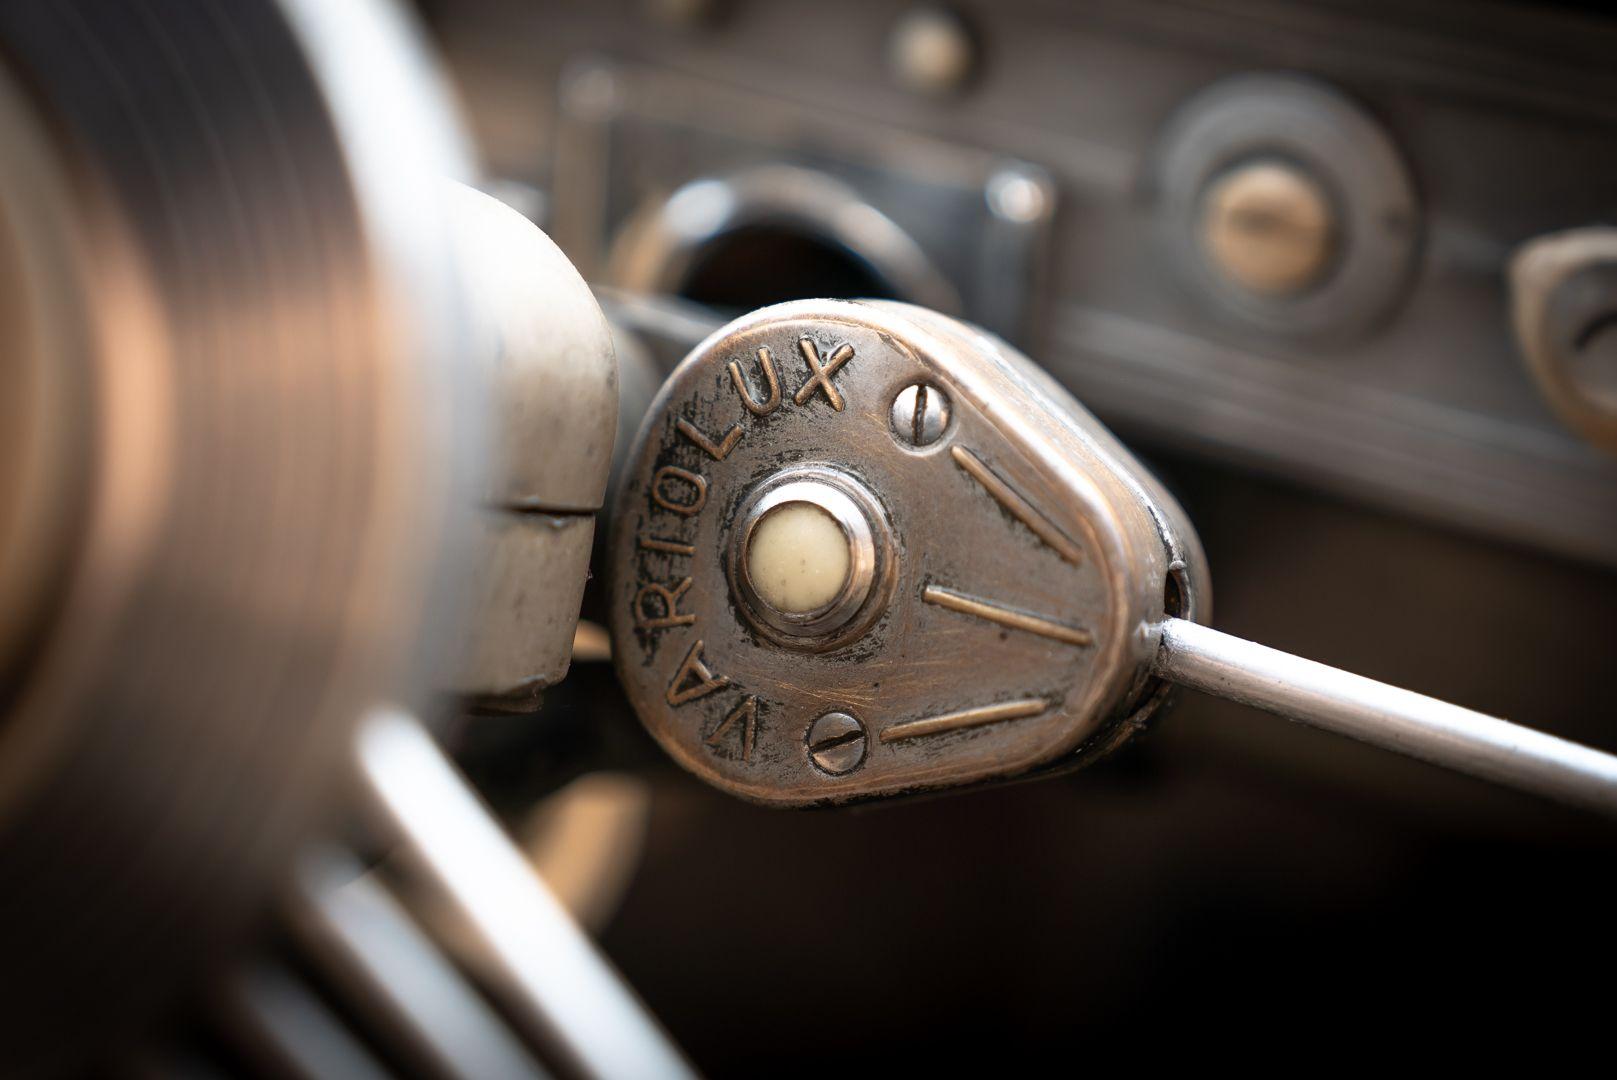 1947 Alfa Romeo Freccia d'oro 6C 2500 Sport 61743